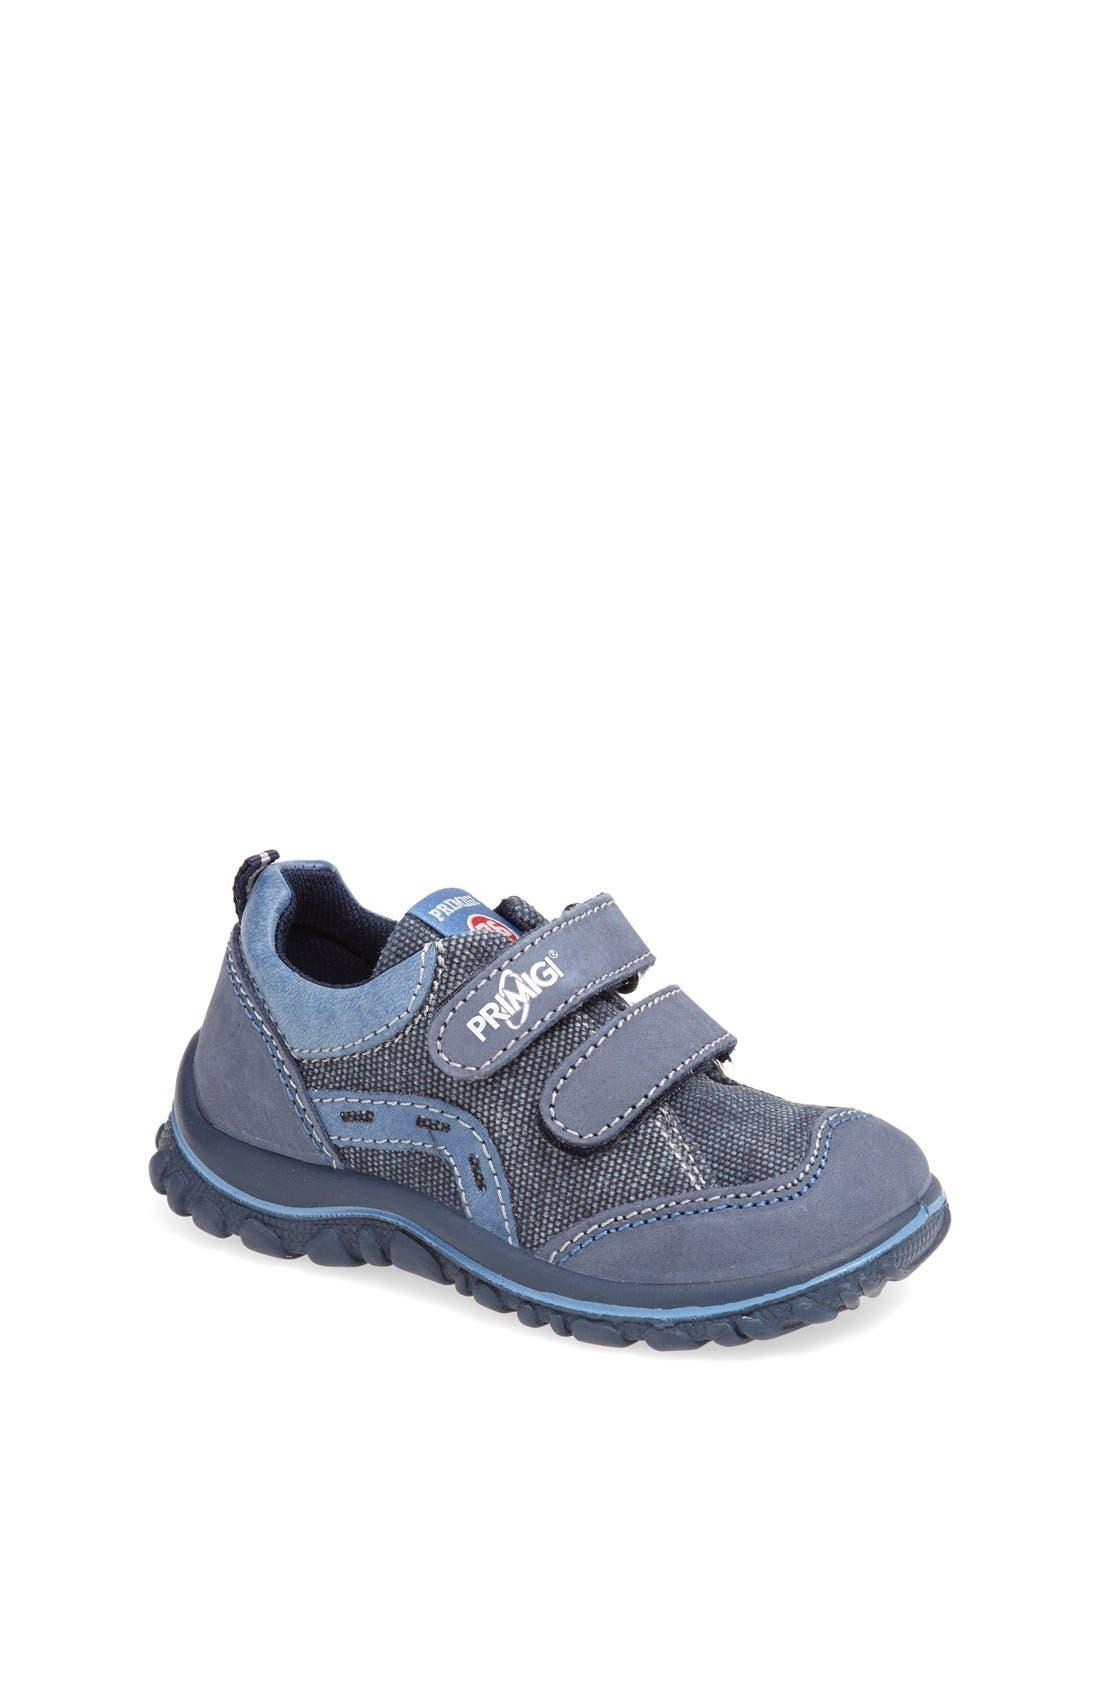 Alternate Image 1 Selected - Primigi 'Biby' Sneaker (Walker, Toddler & Little Kid)